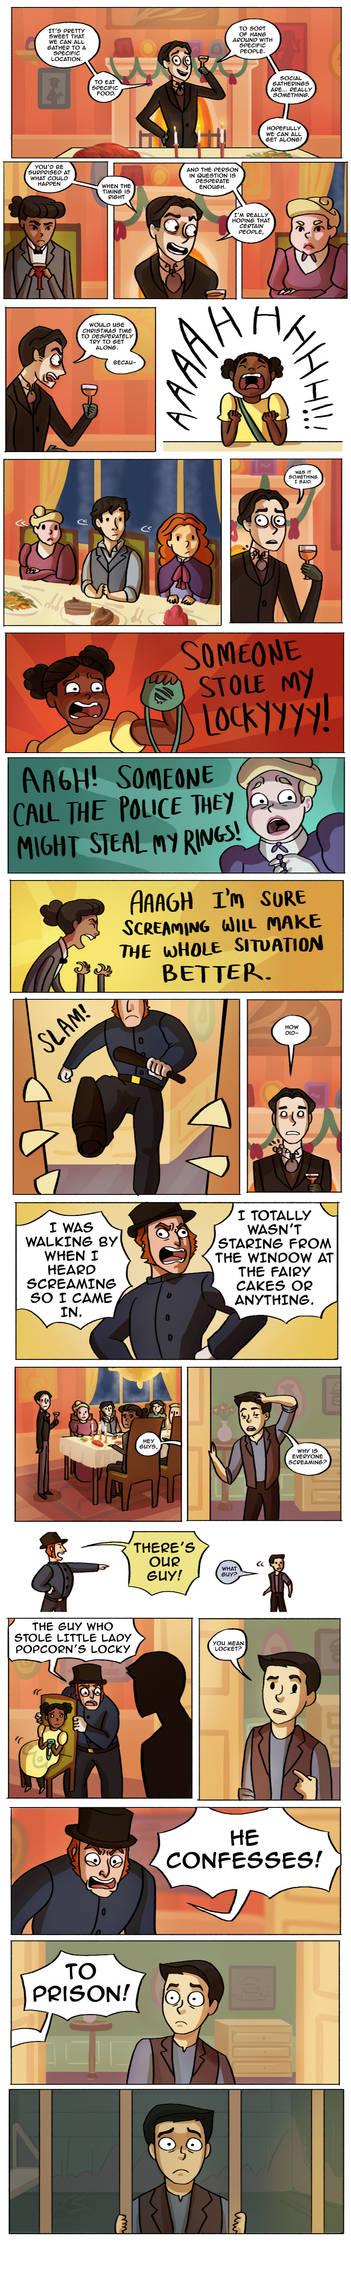 Detective Mimi- page 5